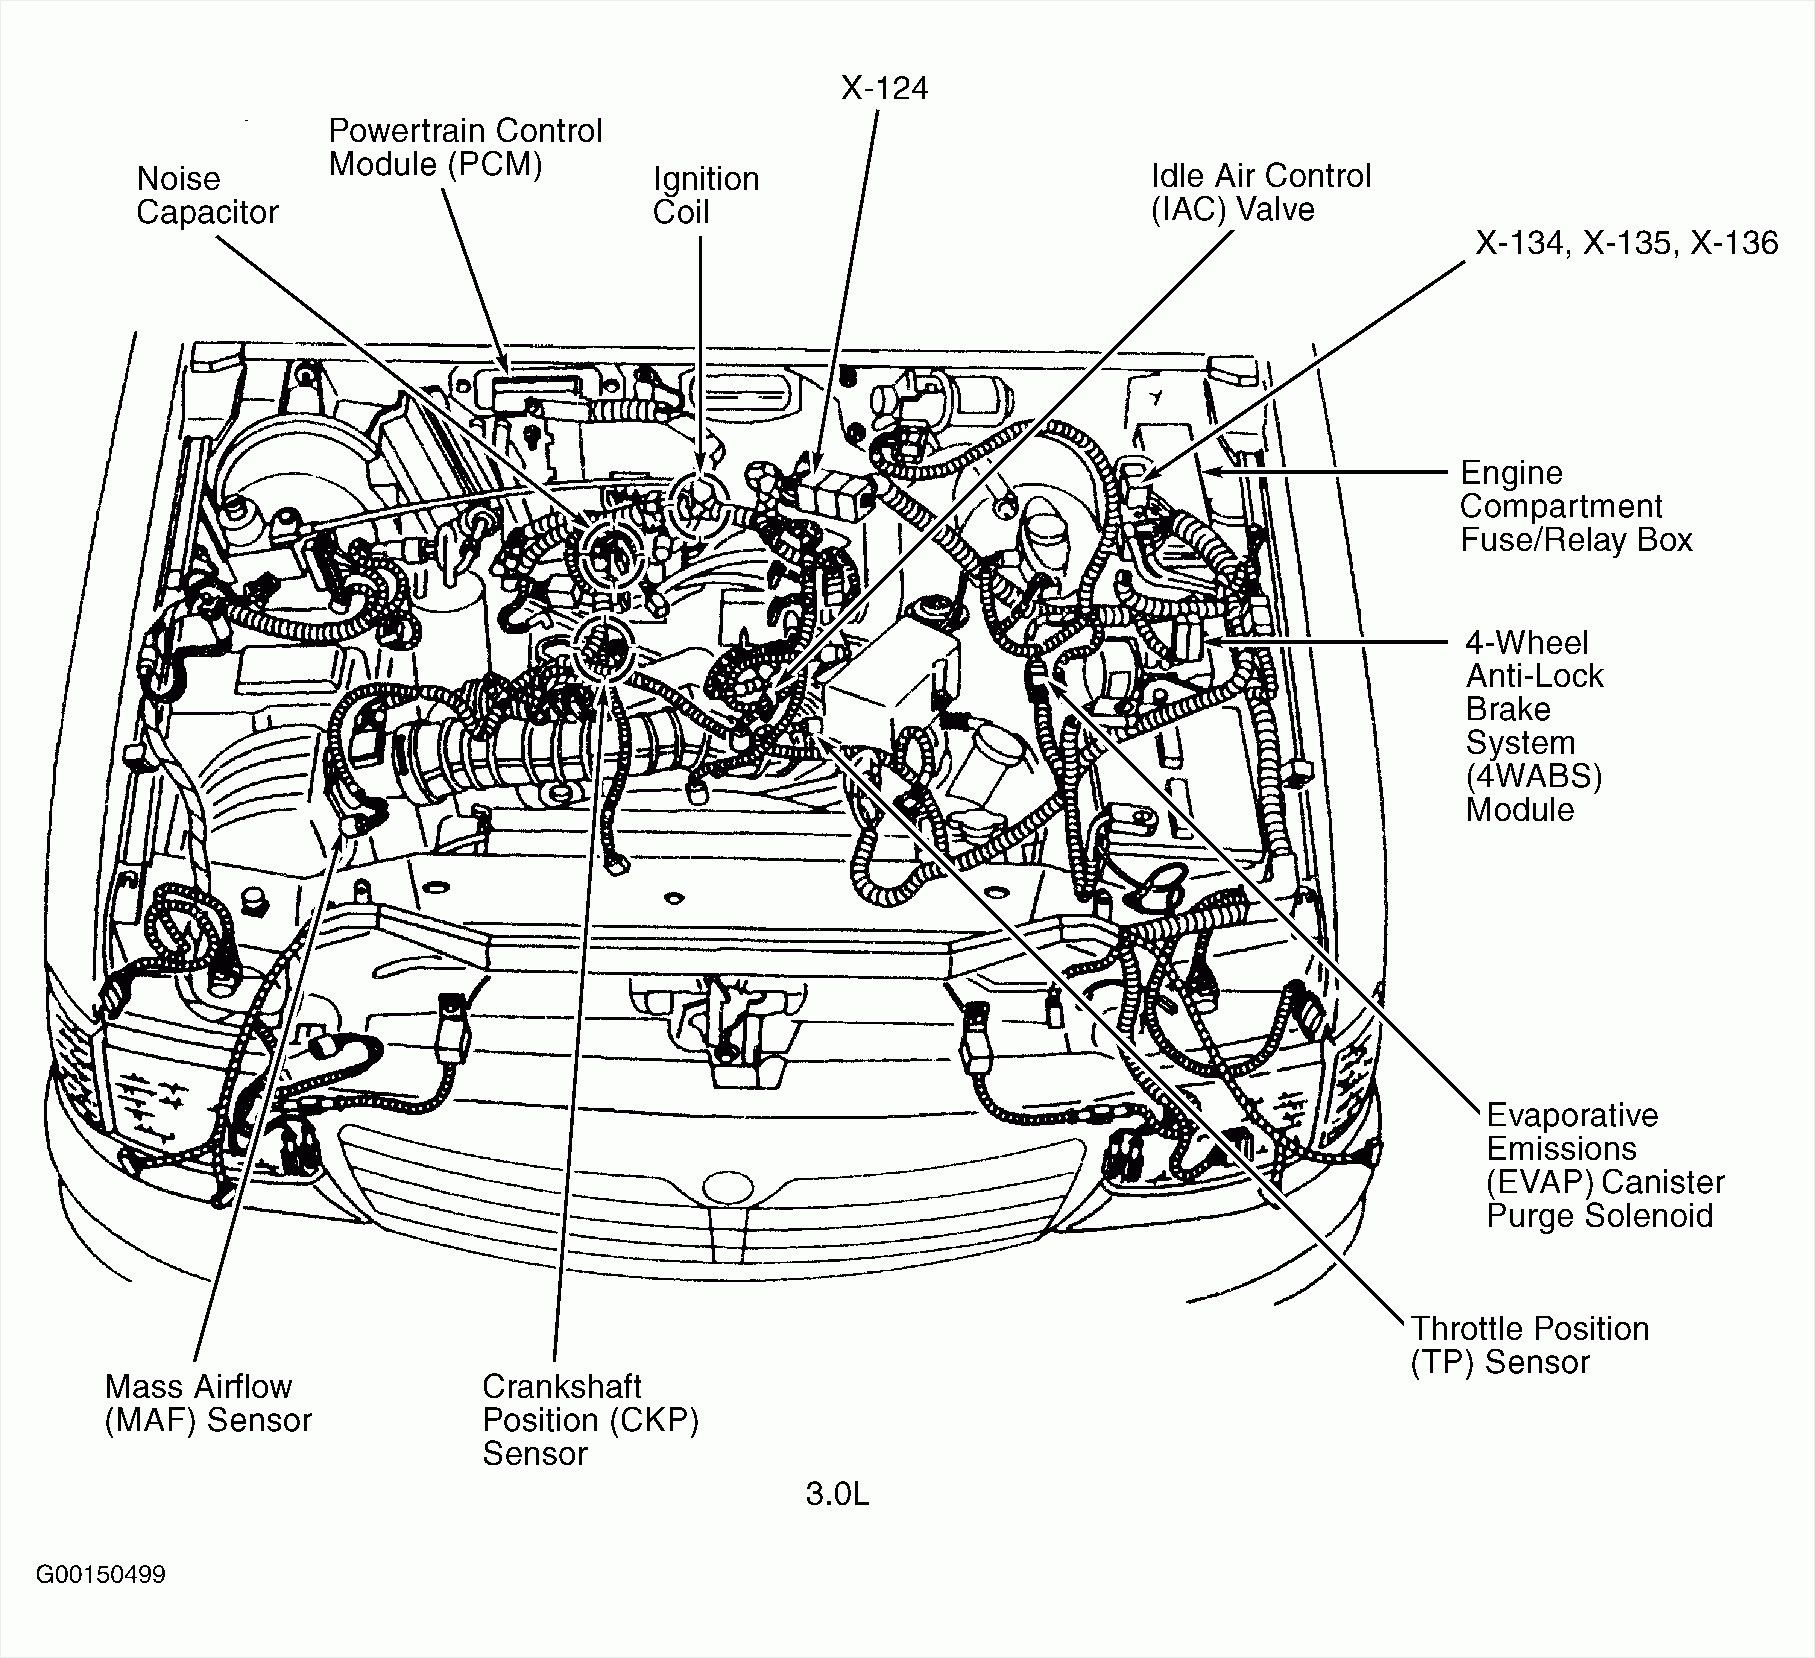 Gm 3 8 Engine Vacuum Line Diagram In 2020 Ford Ranger Mazda Ford Focus Engine